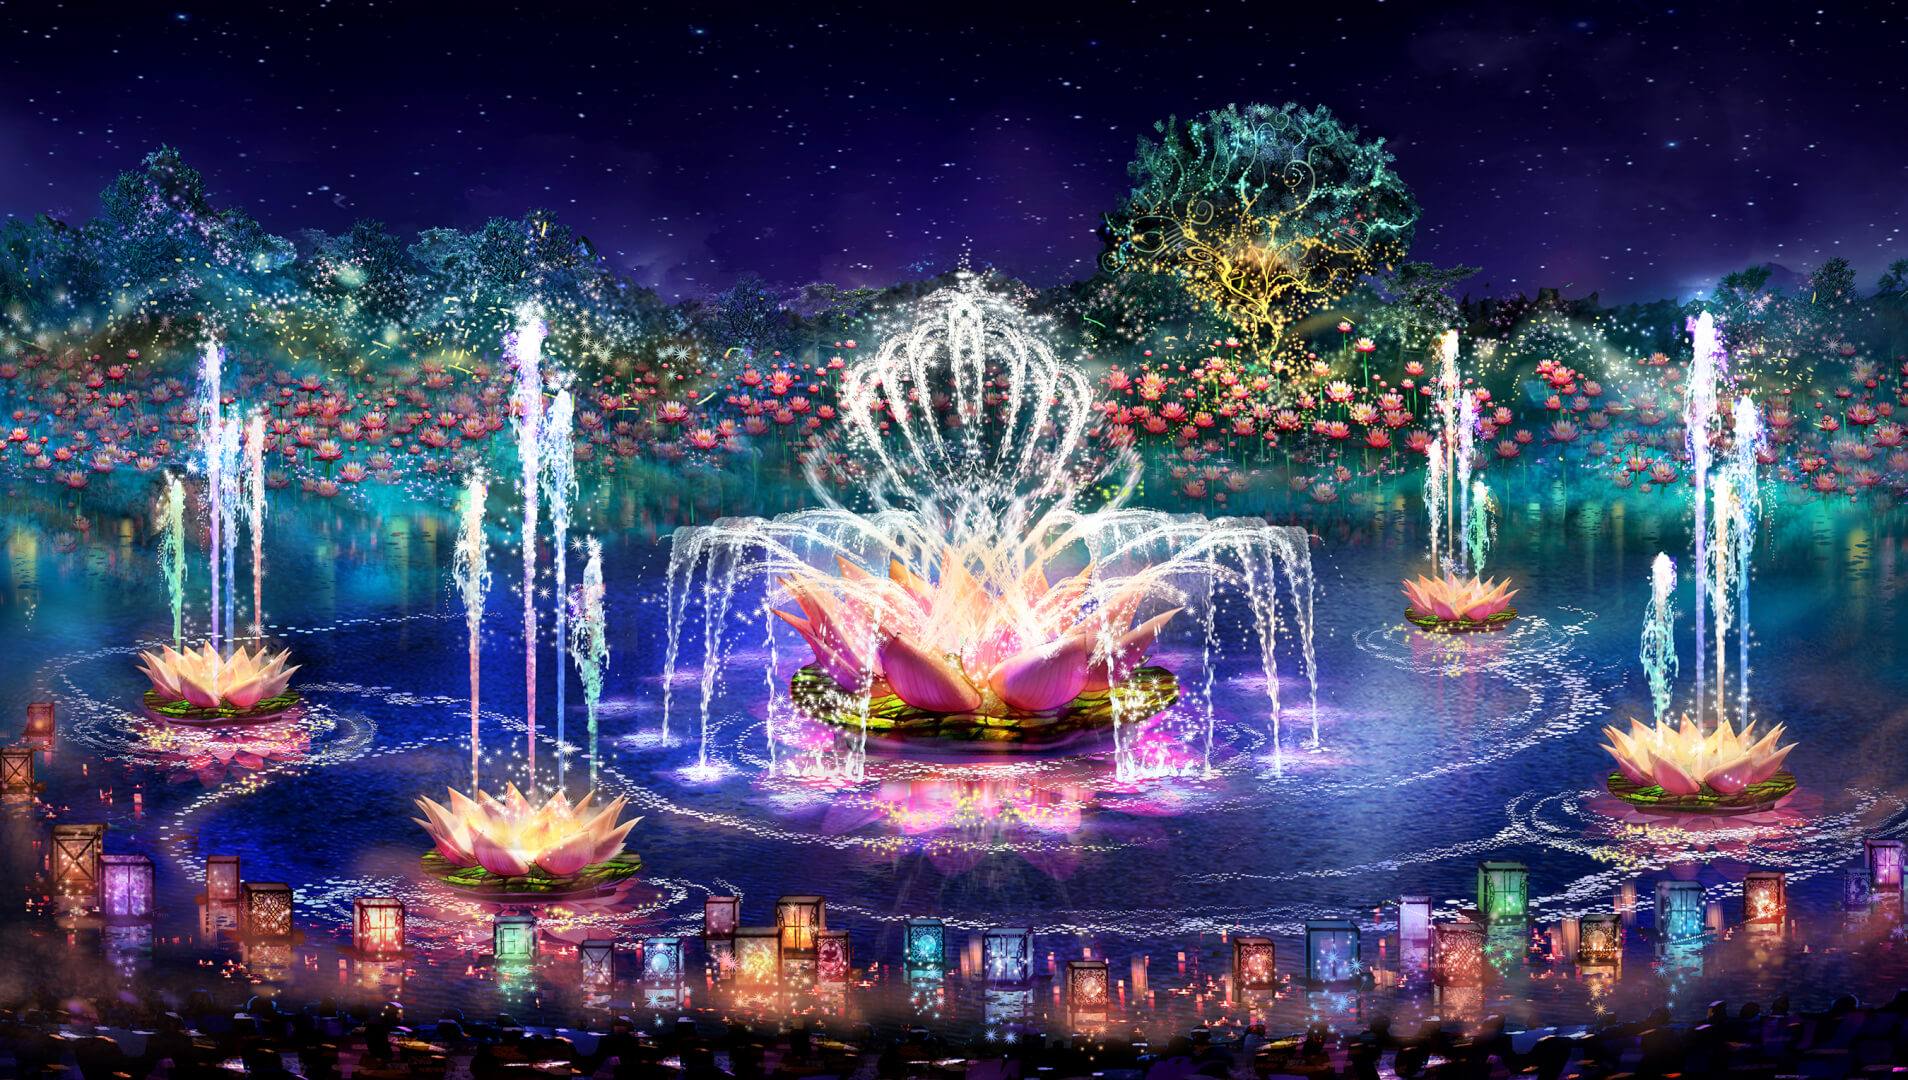 16 Things To Look Forward In 2016 At Walt Disney World